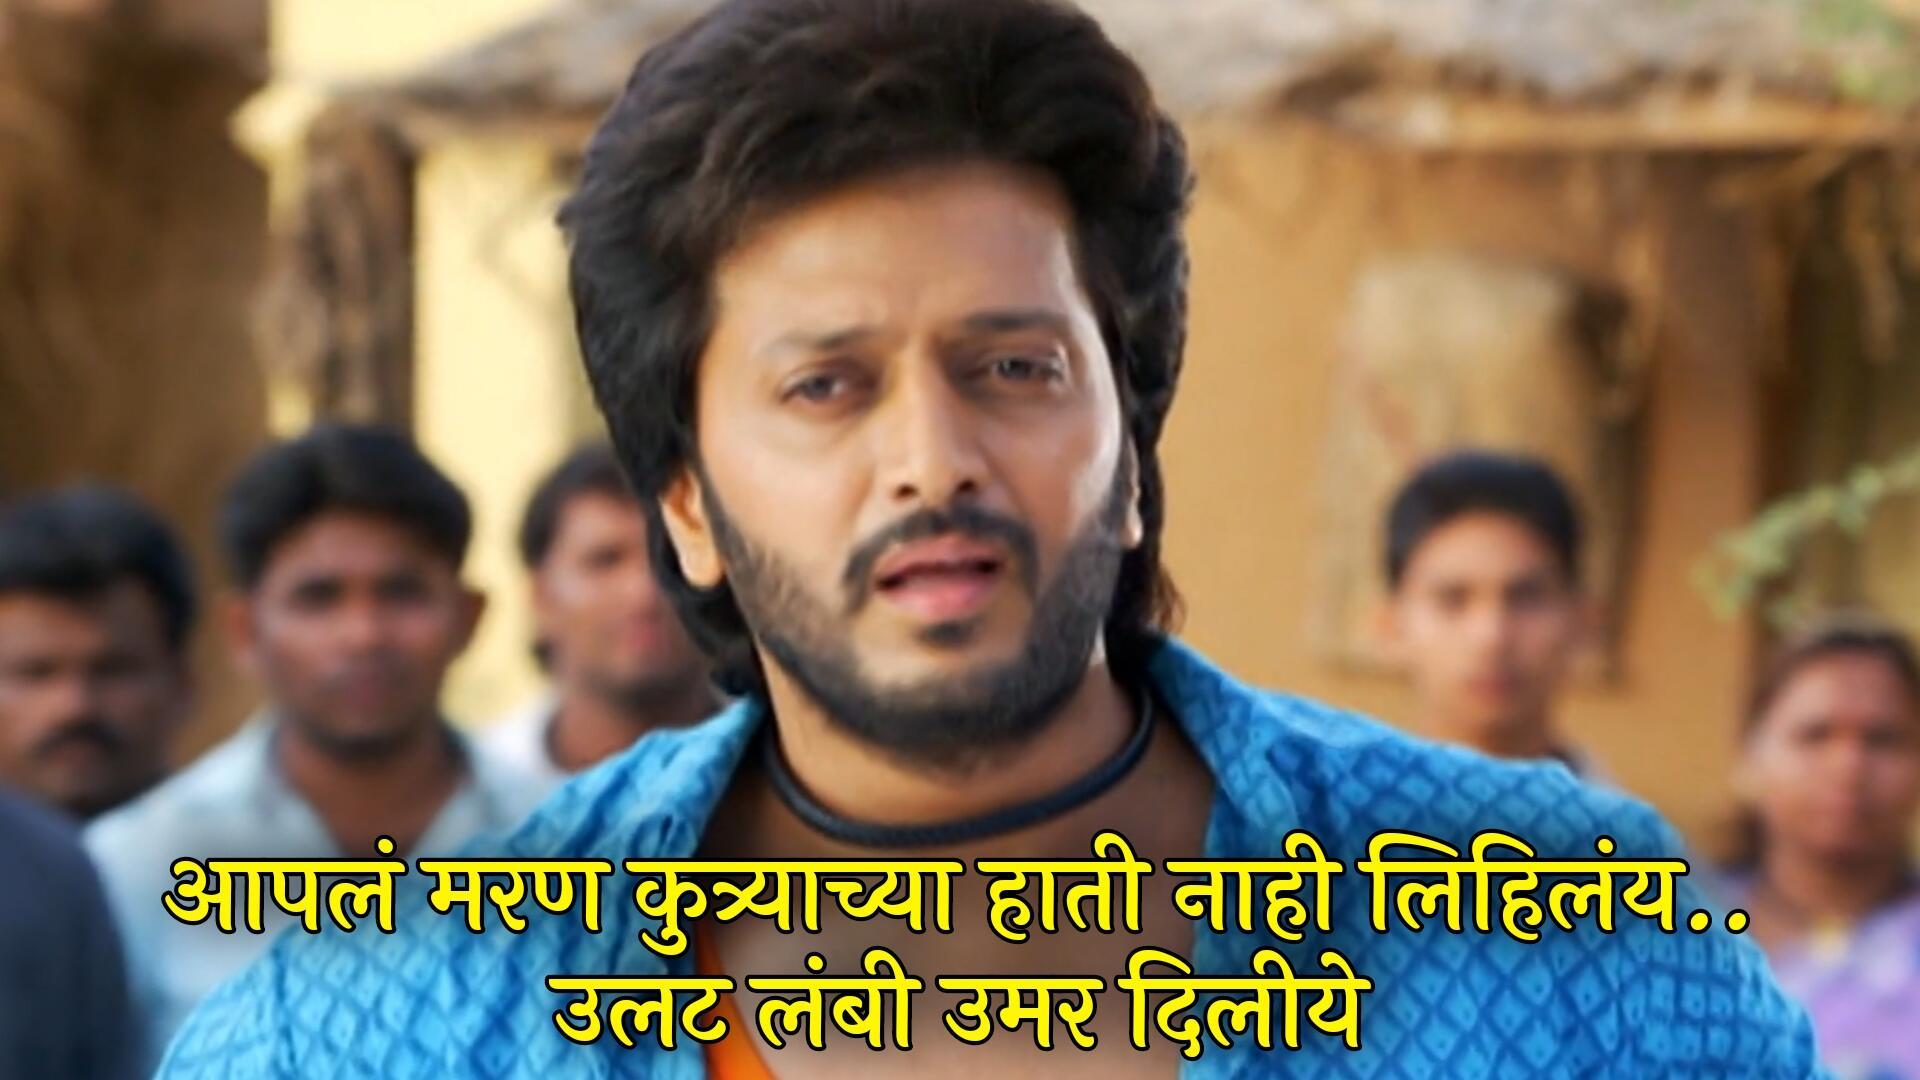 Lai Bhaari Meme Templates